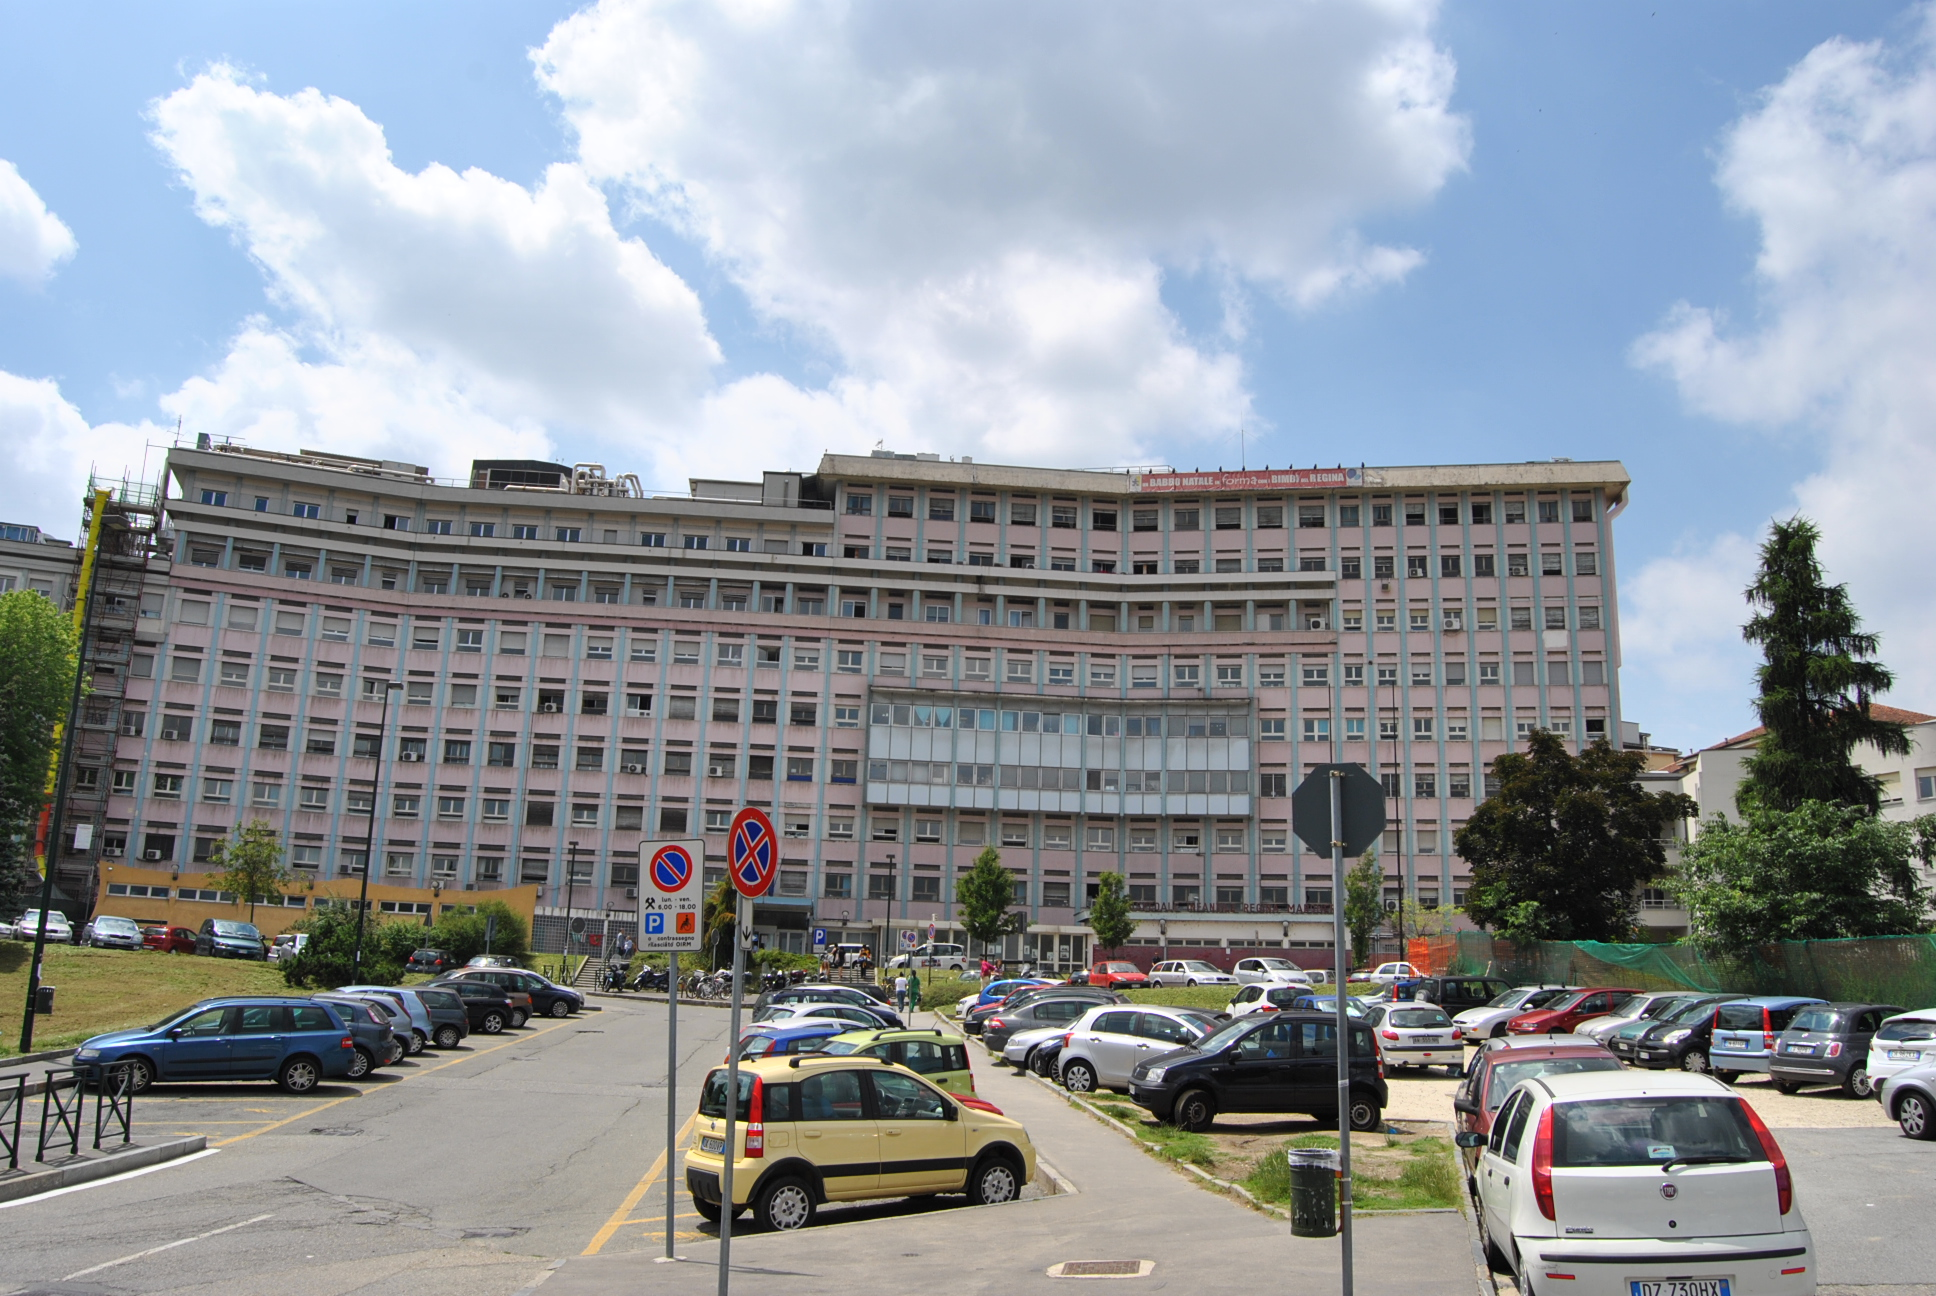 Ospedale Regina Margherita, salvata bimba che aveva ingerito uno spillo